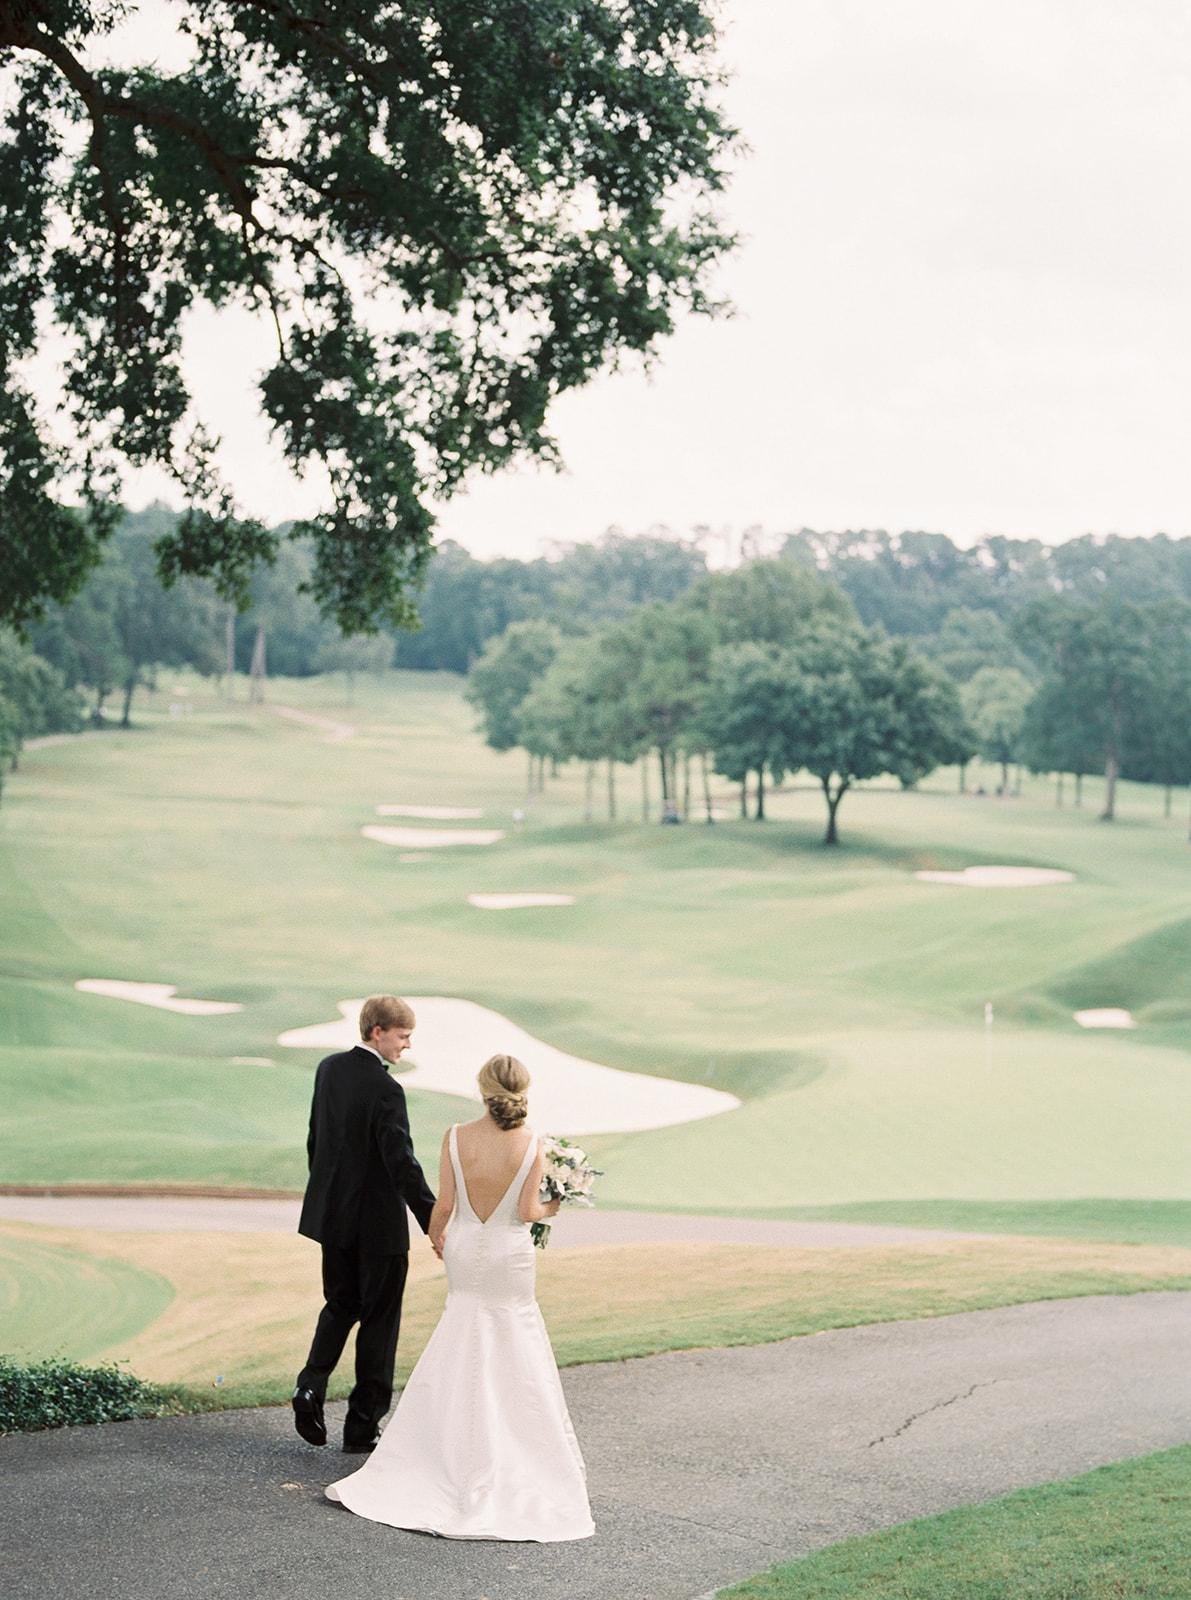 Bride and groom, open back wedding dress | Country club wedding | Birmingham, Alabama wedding | Taylor Dane Photography | Custom wedding invitations by Little Fox Paperie | Gracie Nunez